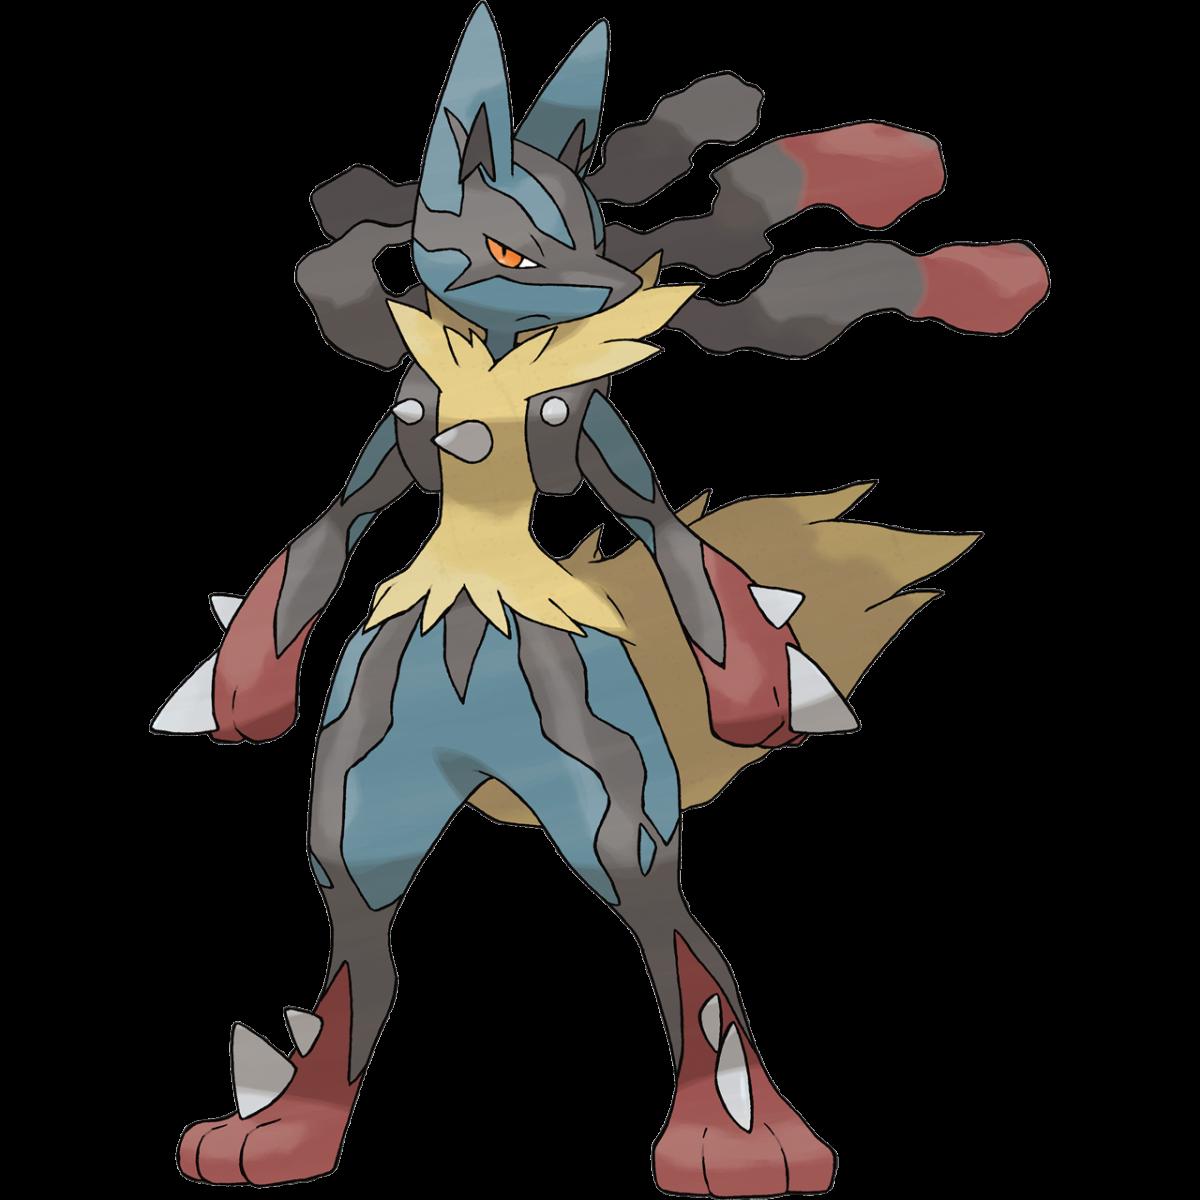 pokemon-x-and-y-walkthrough-pokemon-move-sets-lucario